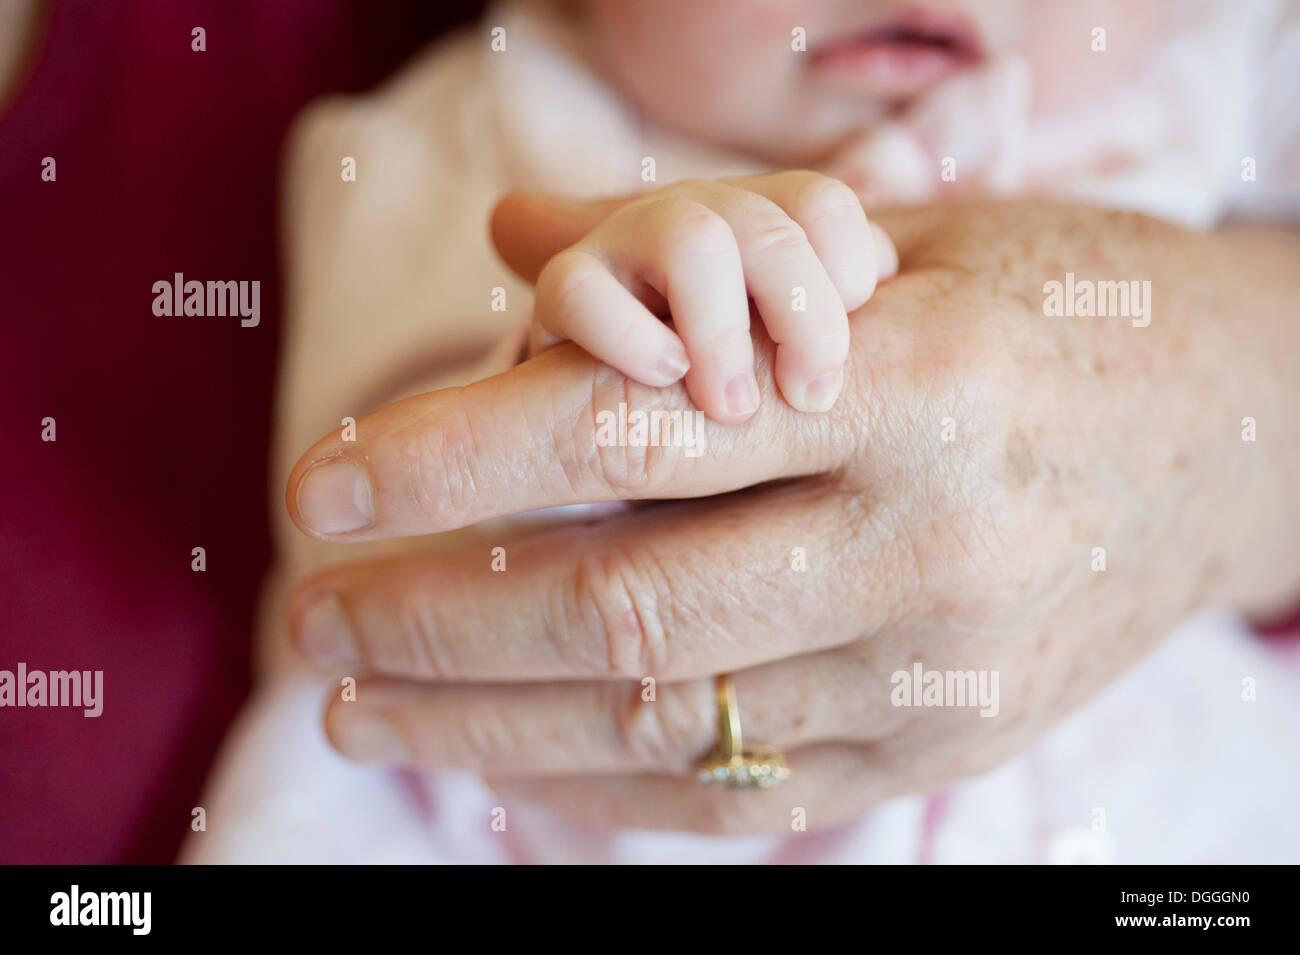 Baby girl holding senior woman's hand, close up Stock Photo